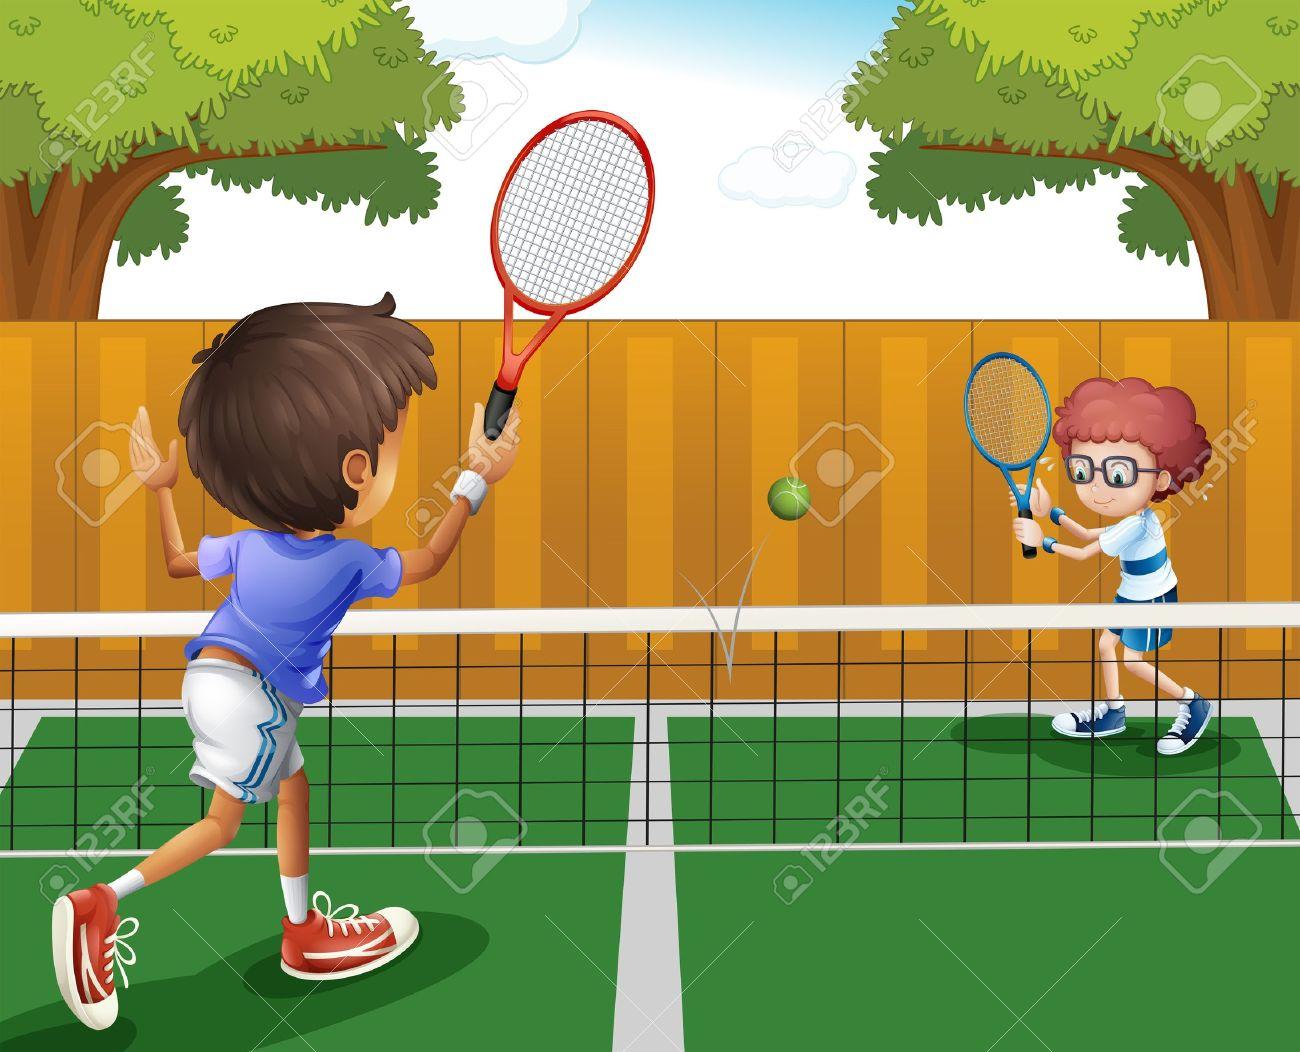 Lawn Tennis Illustration